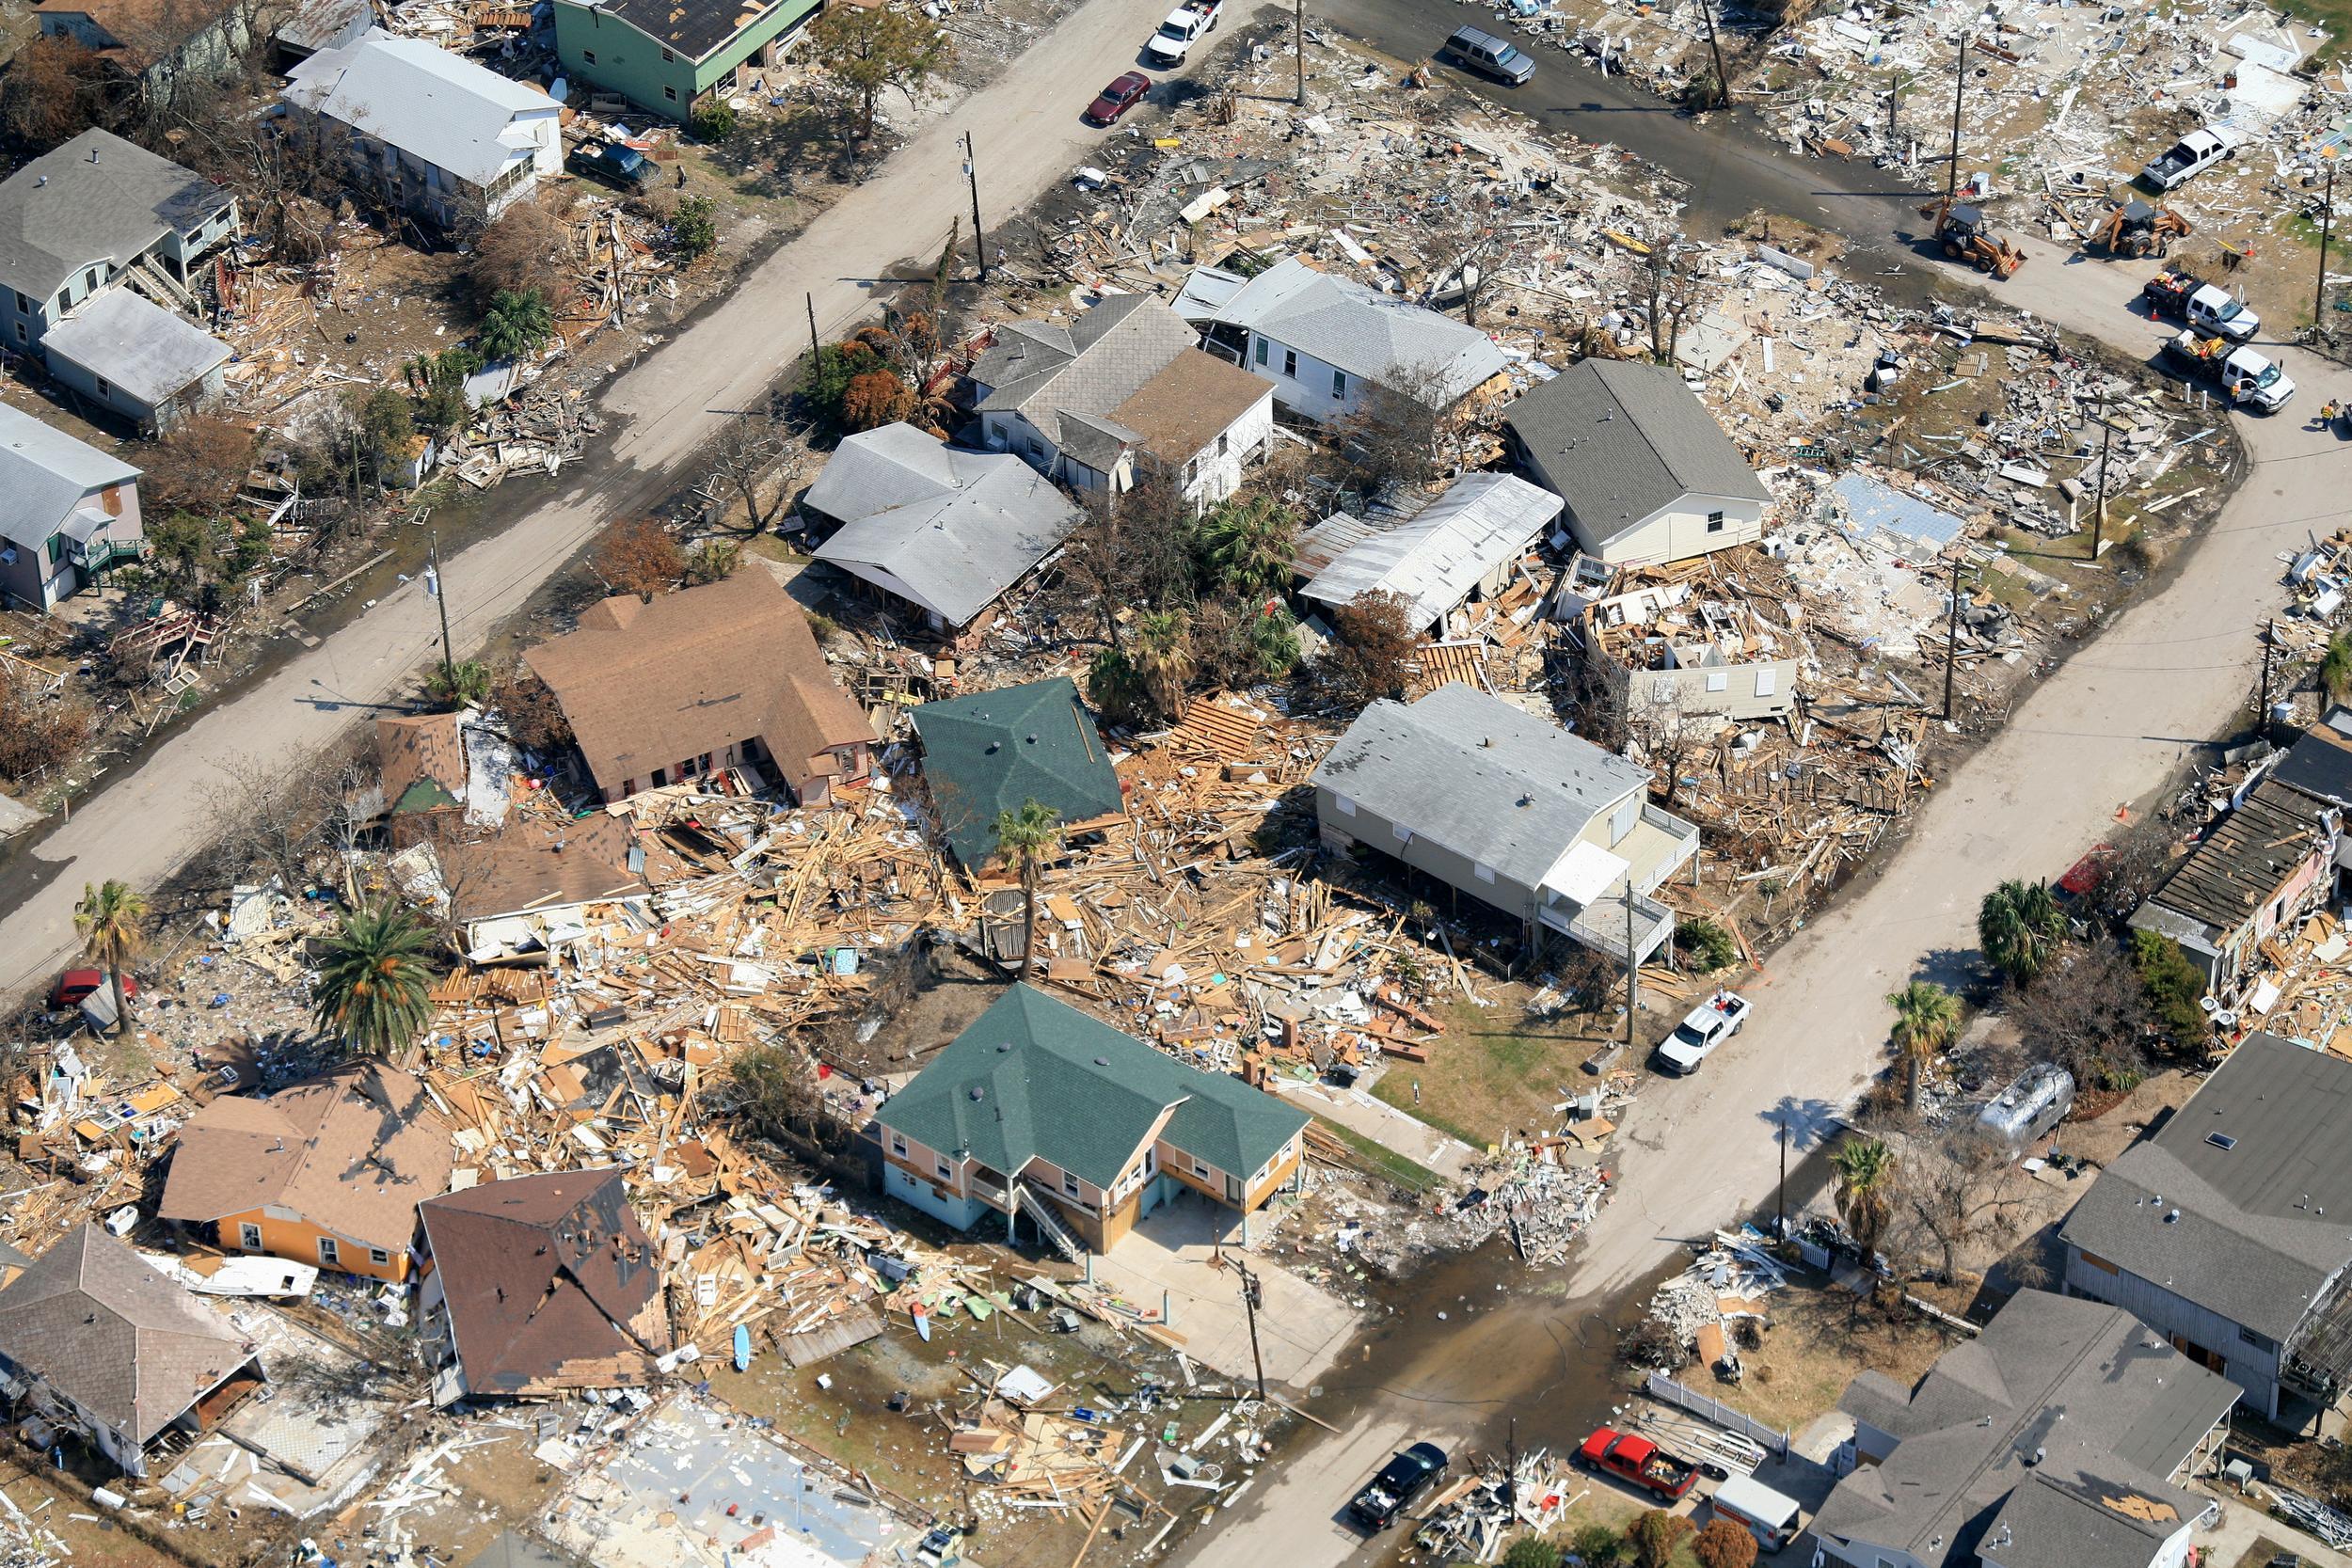 Hurricane Aerial Photography, Corpus Christi, Texas - Corpus Christi Aerial Photography - Corpus Christi Hurricane Photography